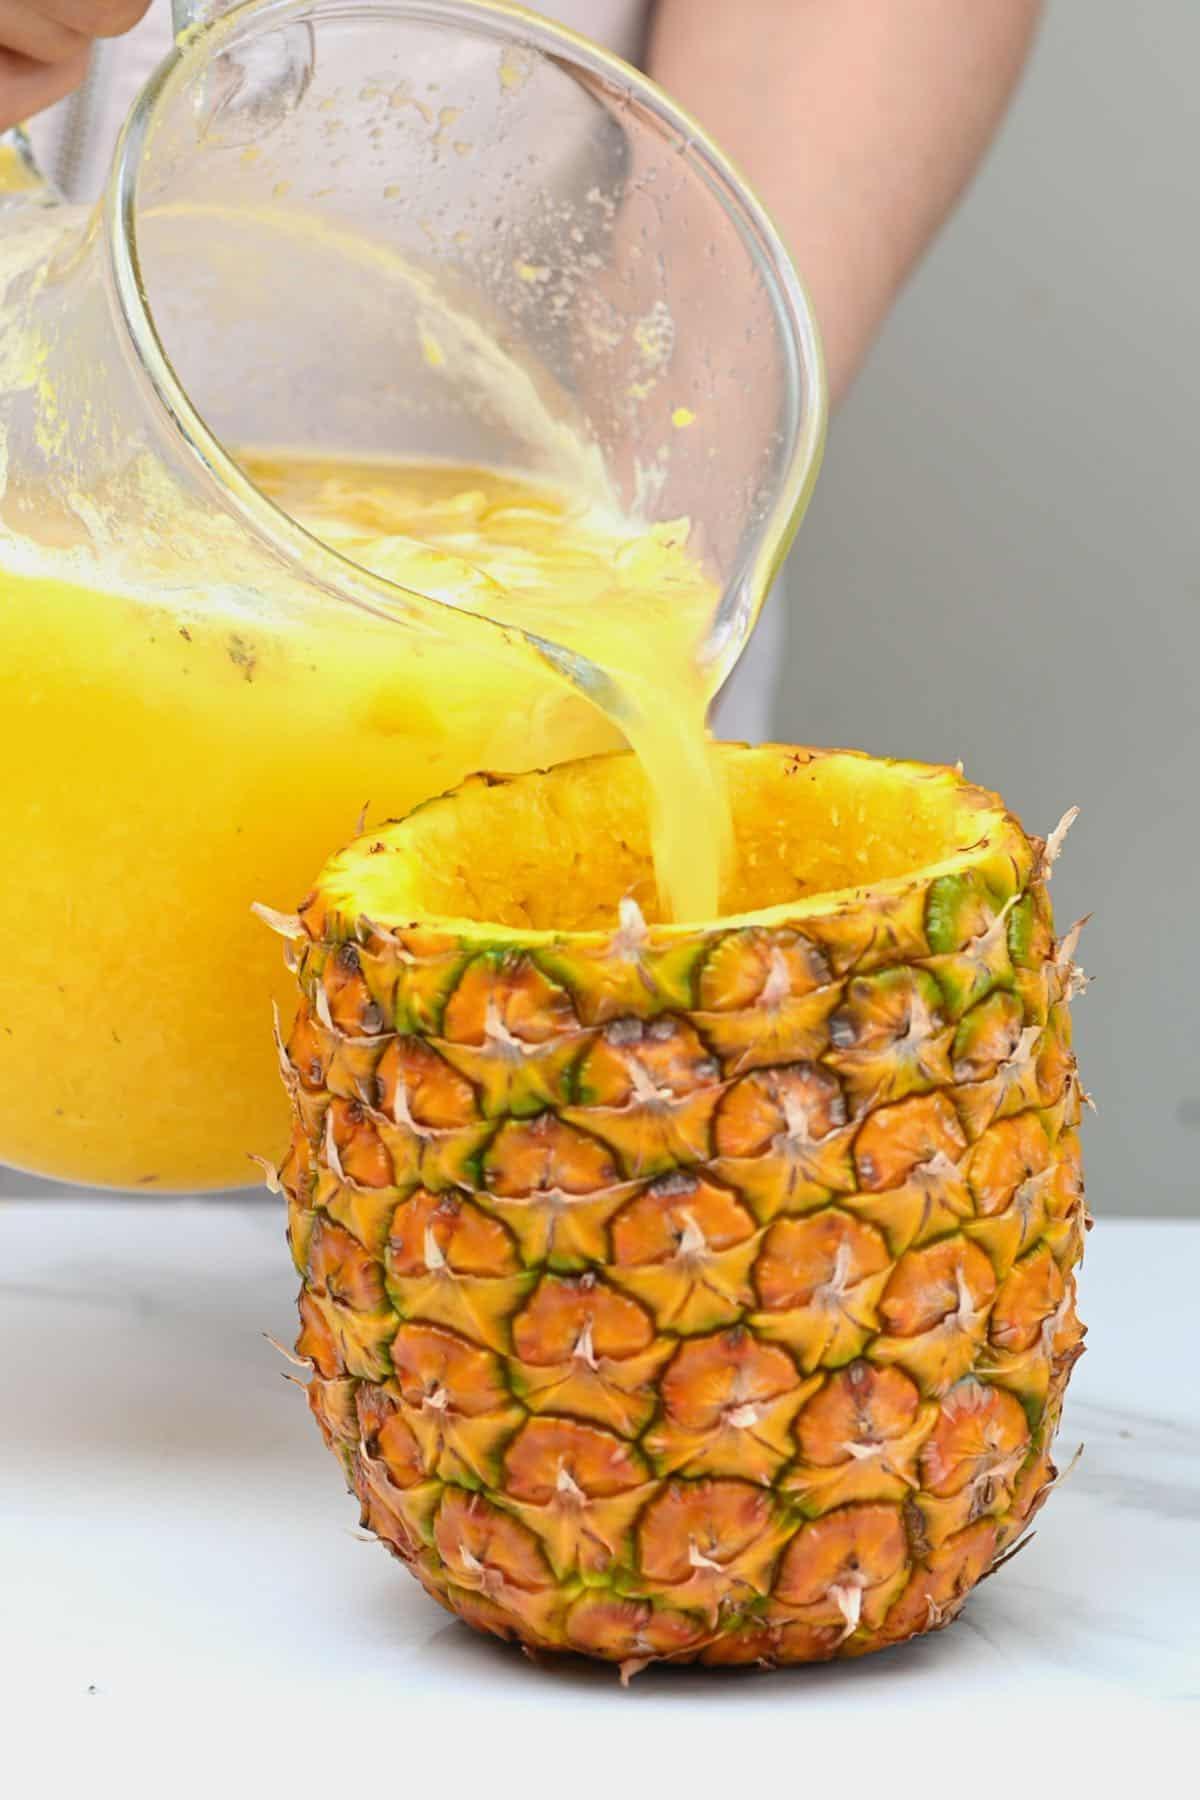 Pouring pineapple lemonade in a pineapple shell